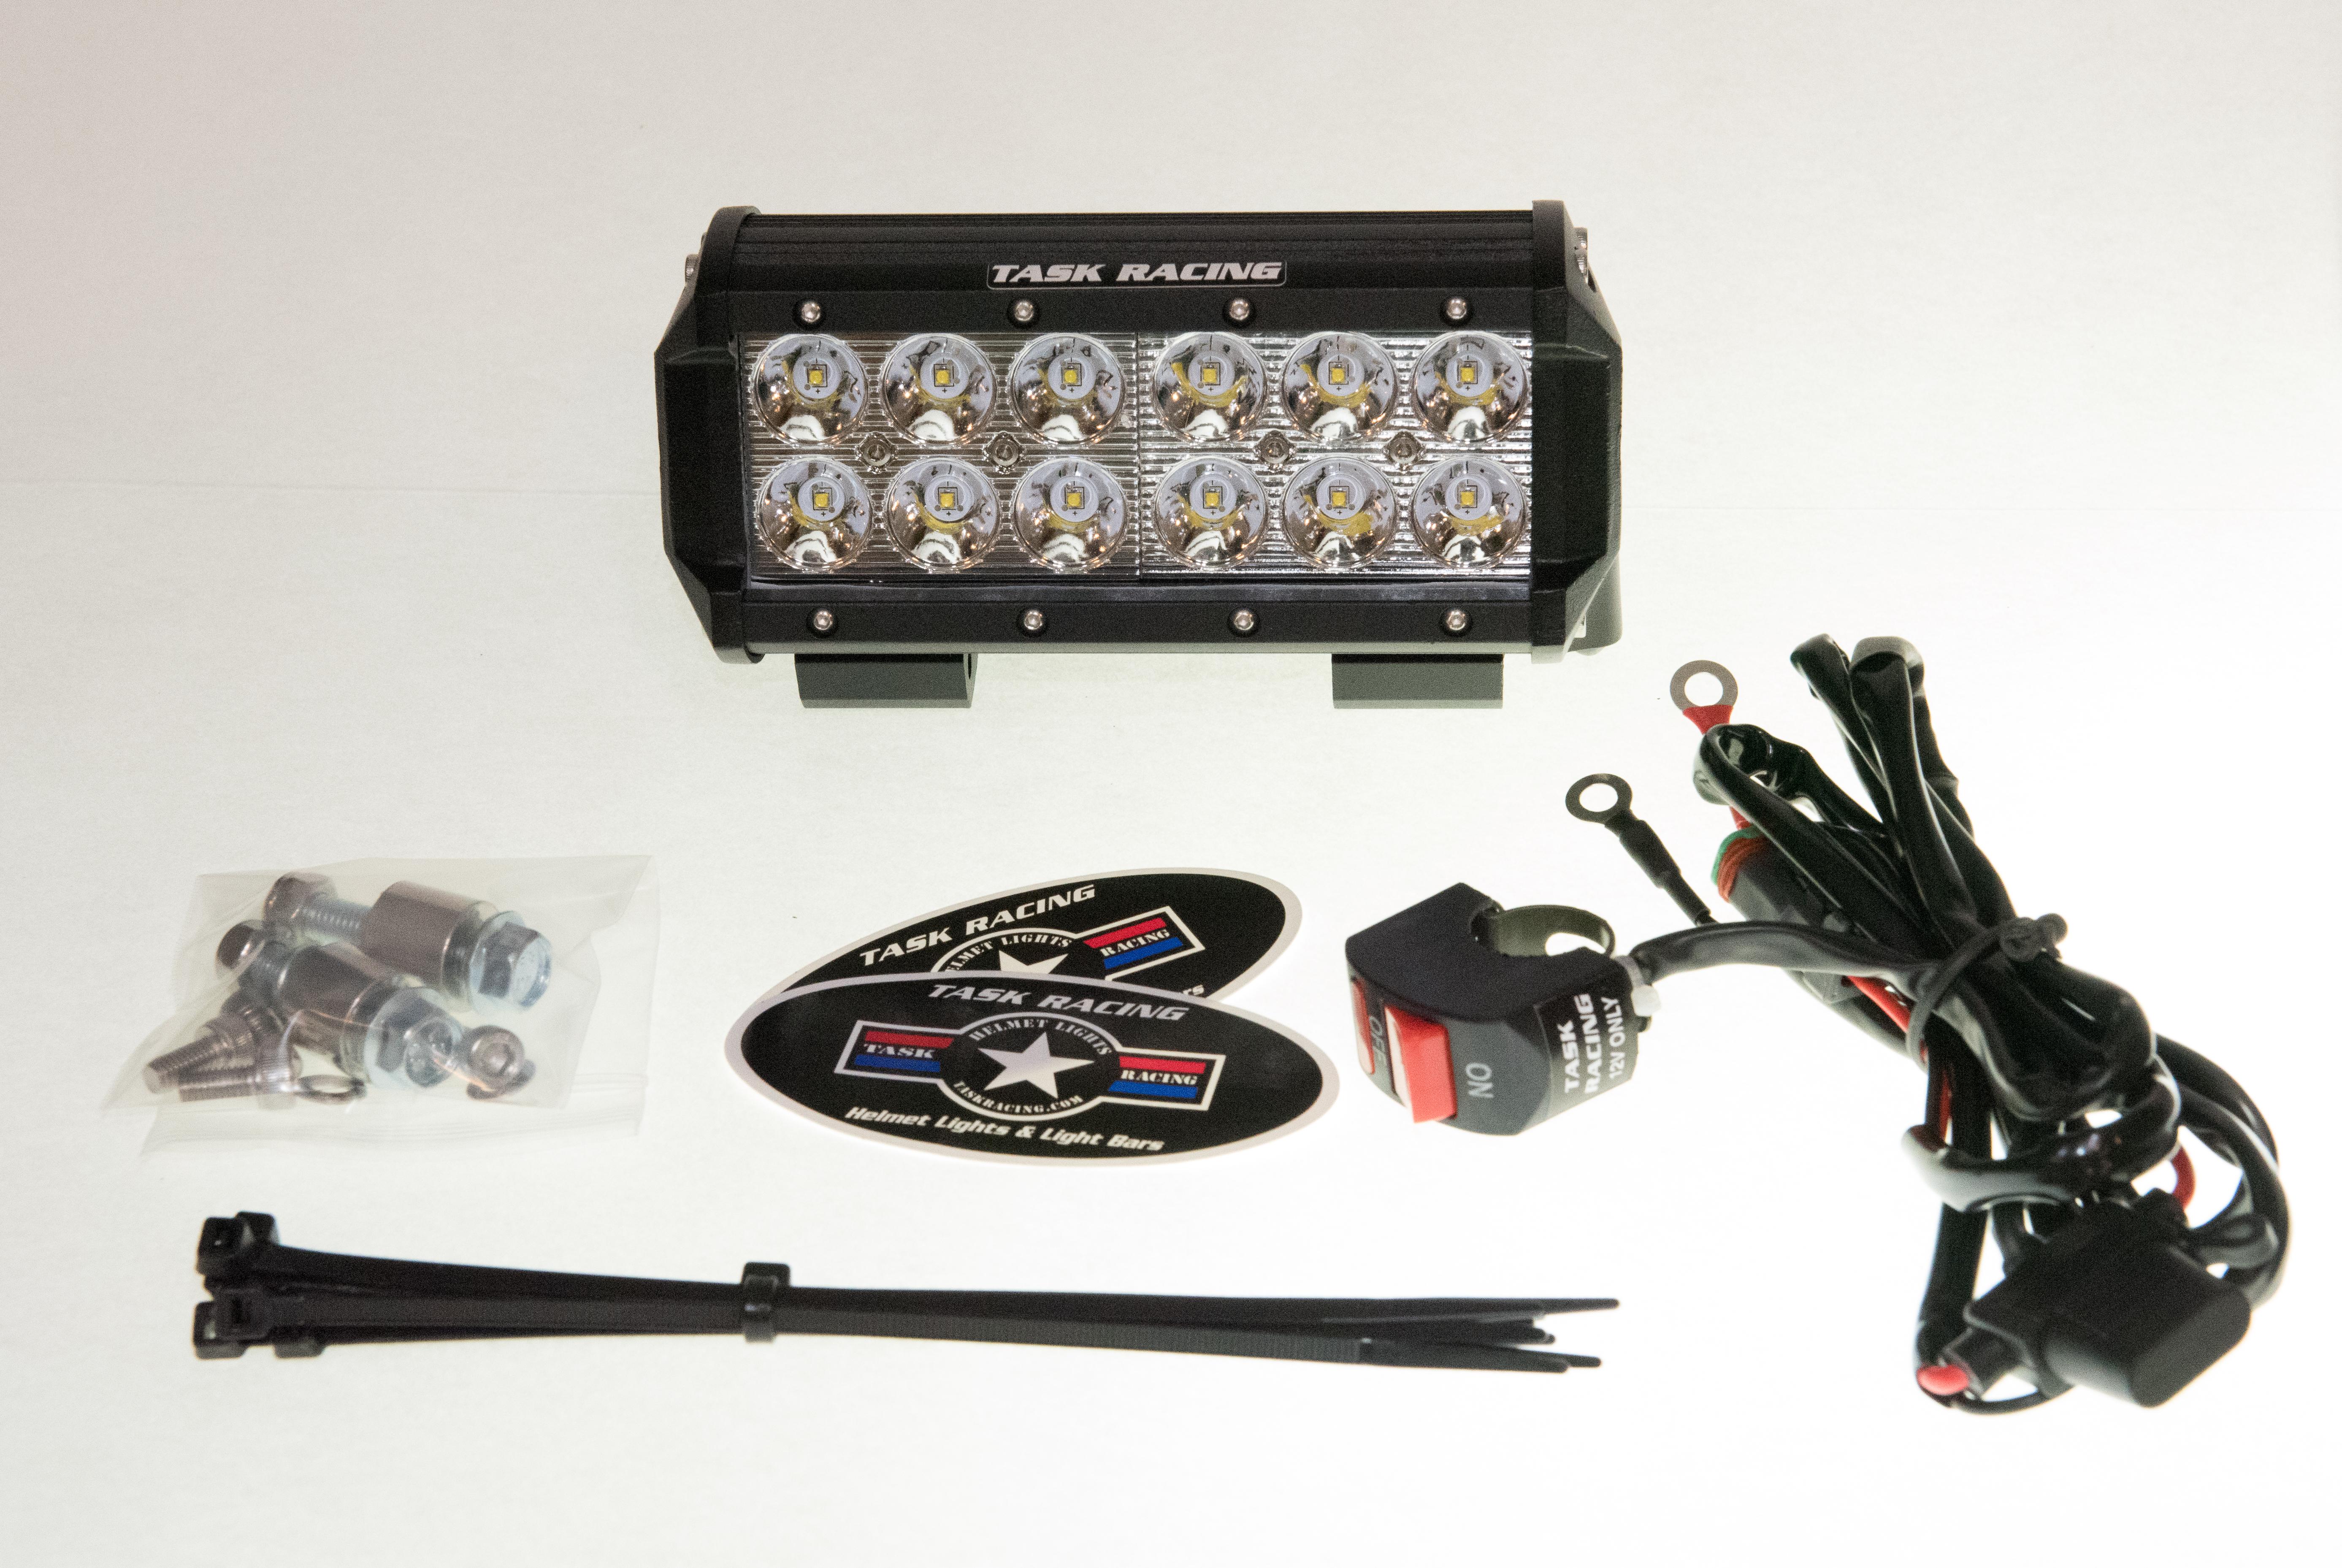 6 hardwire light bar package task racing 6 hardwire light bar package aloadofball Images